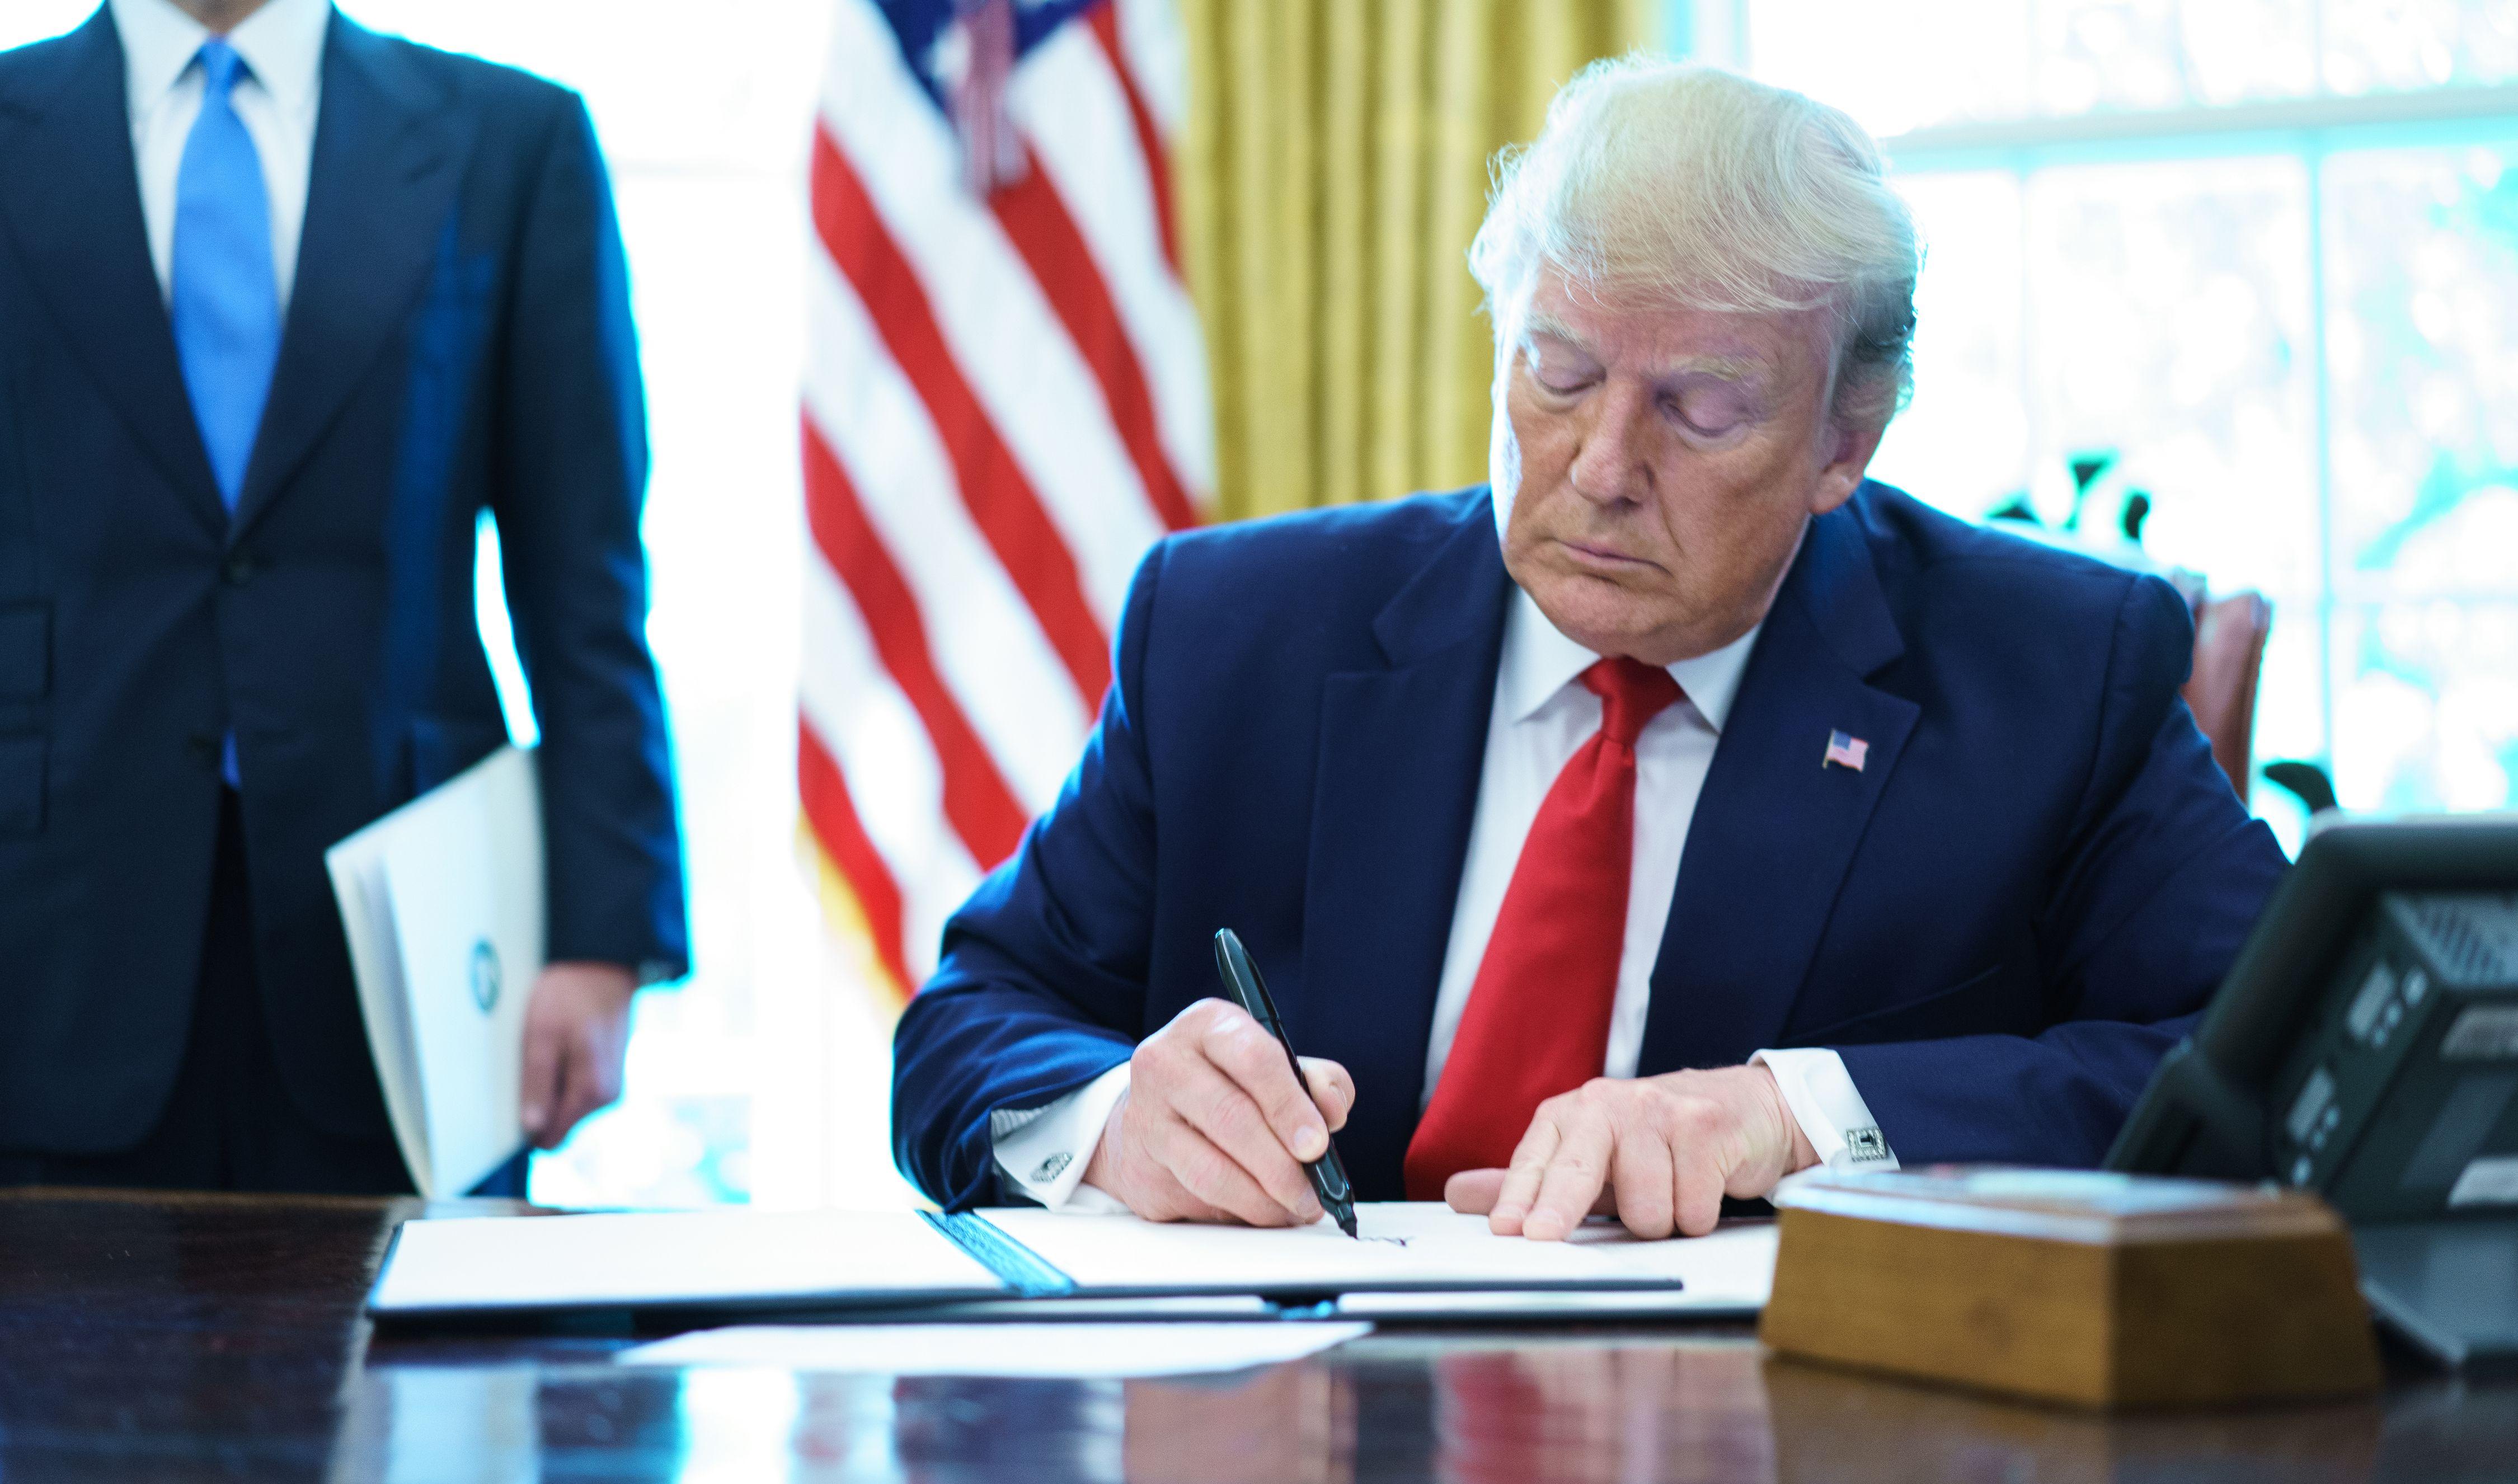 Live updates: Trump expected to impose more sanctions on Iran - CNNPolitics